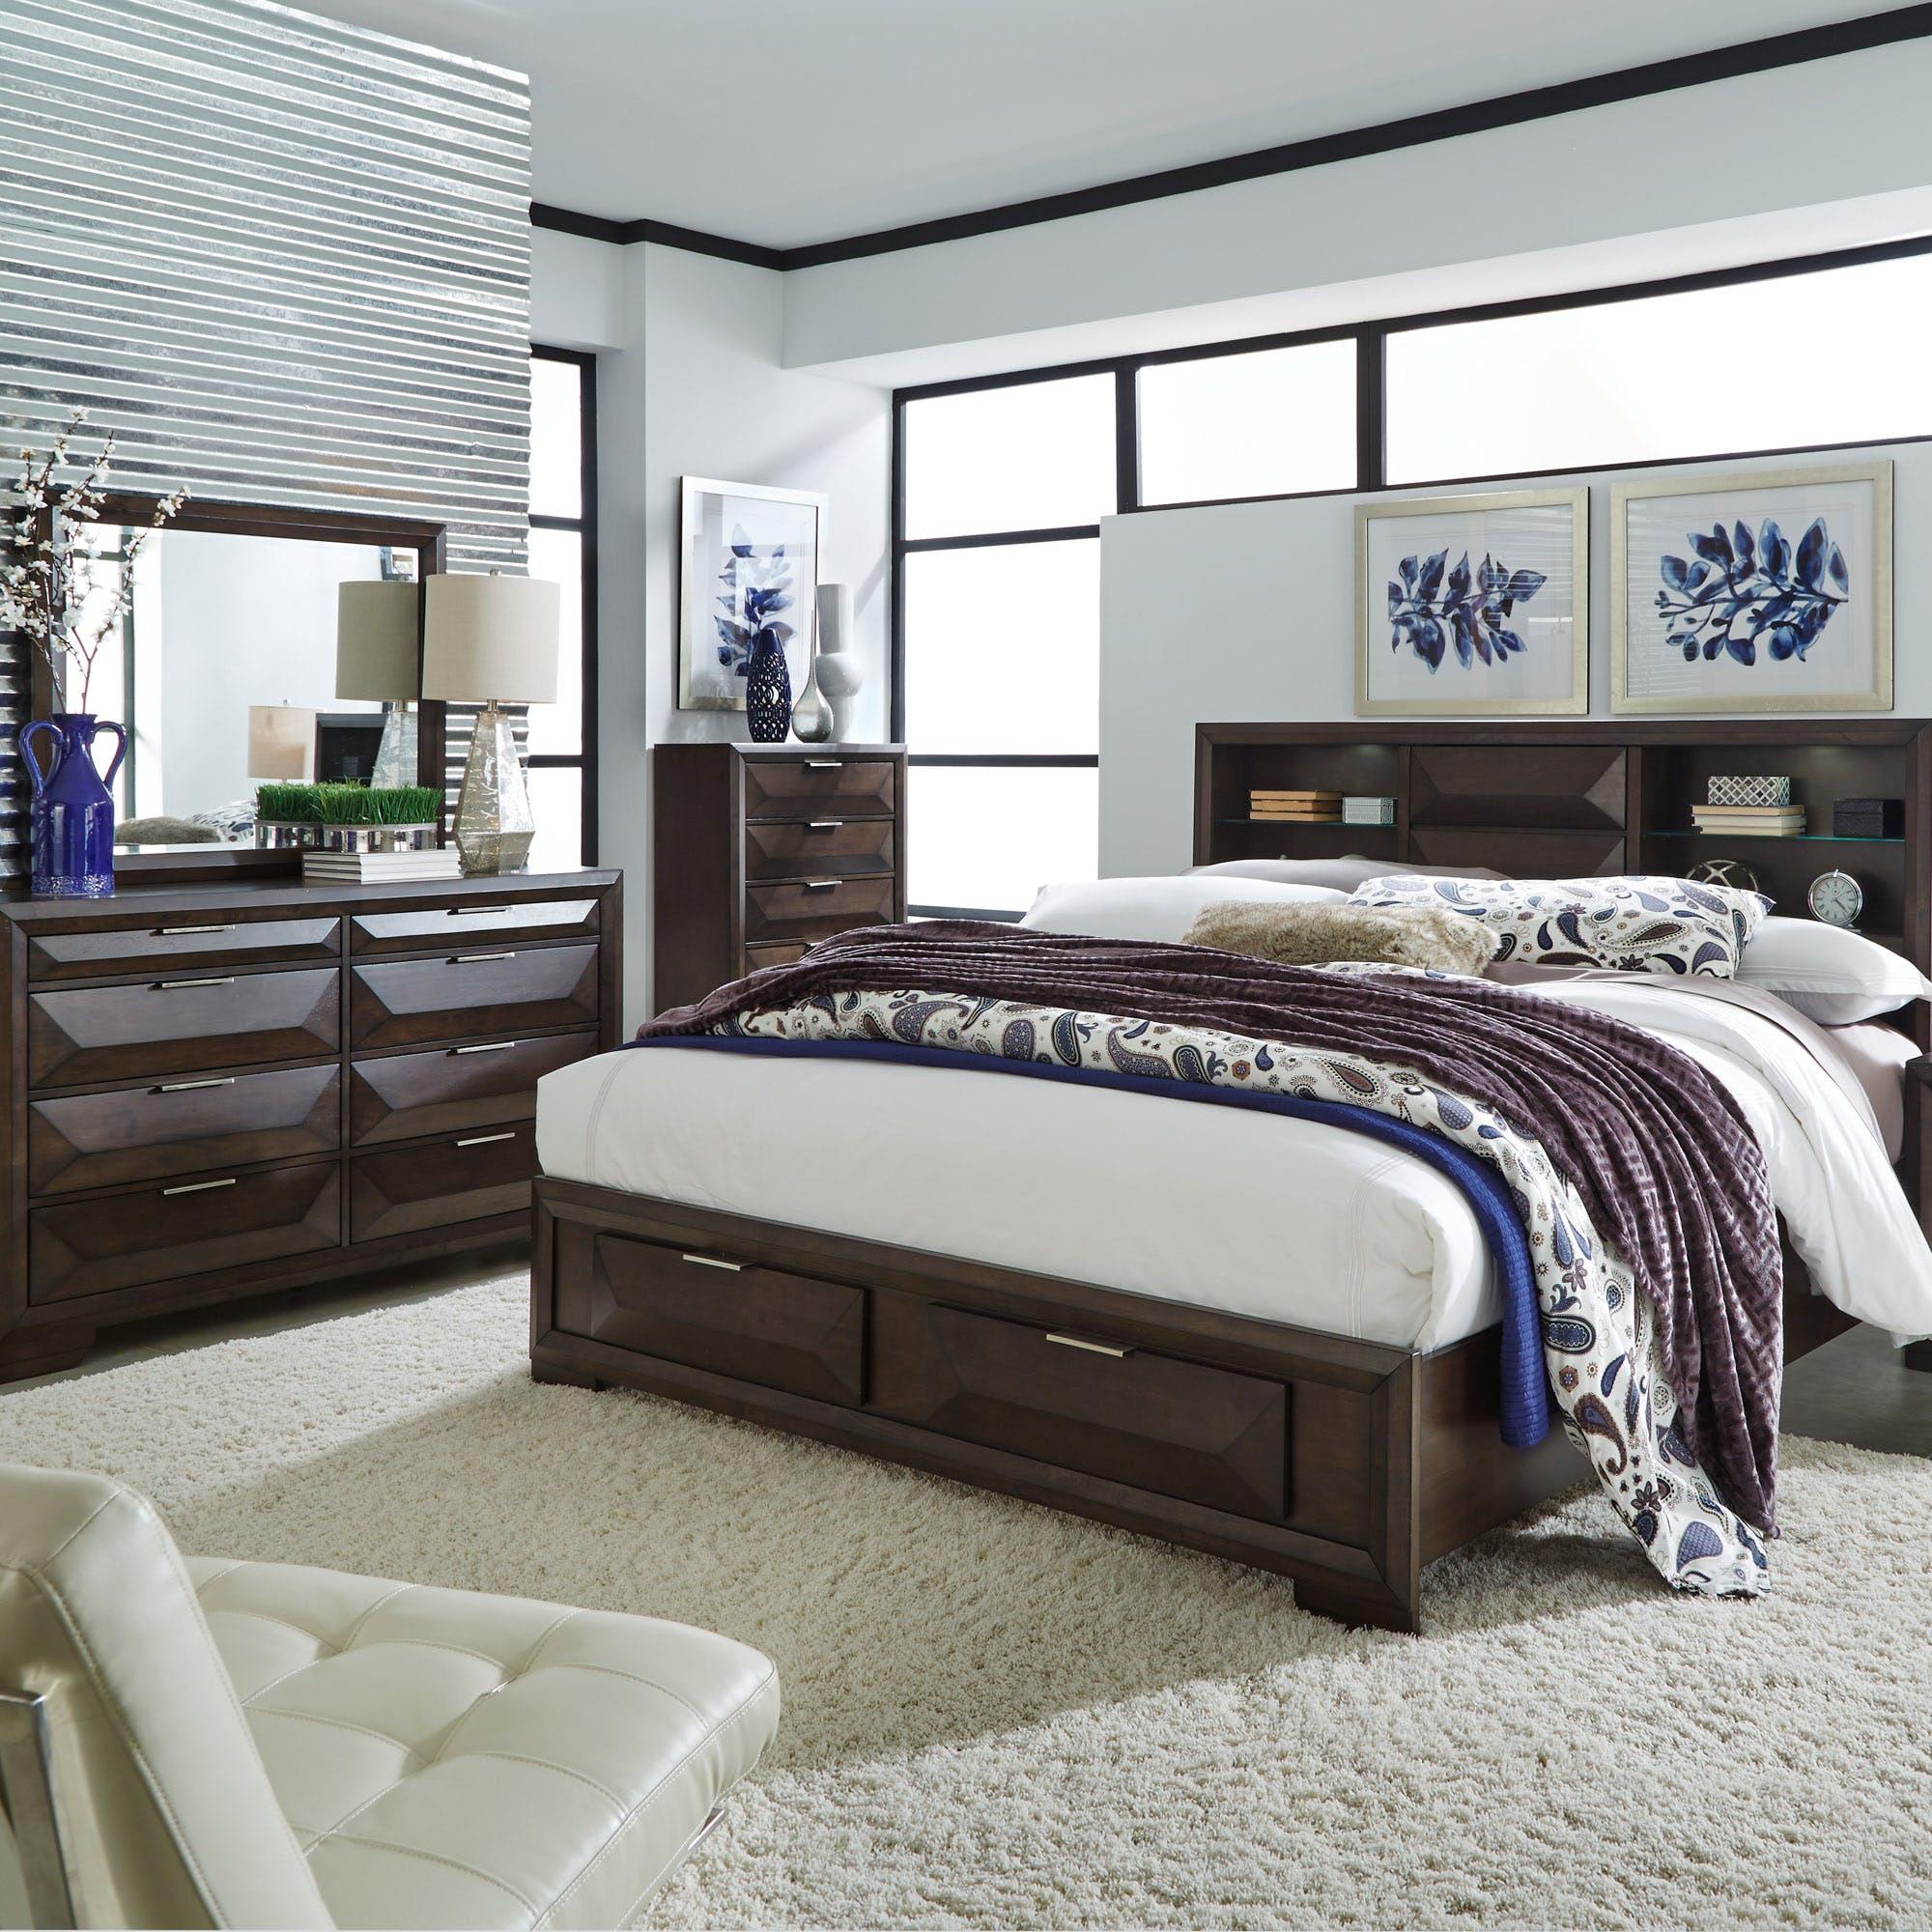 Bedroom Set Buying Guide